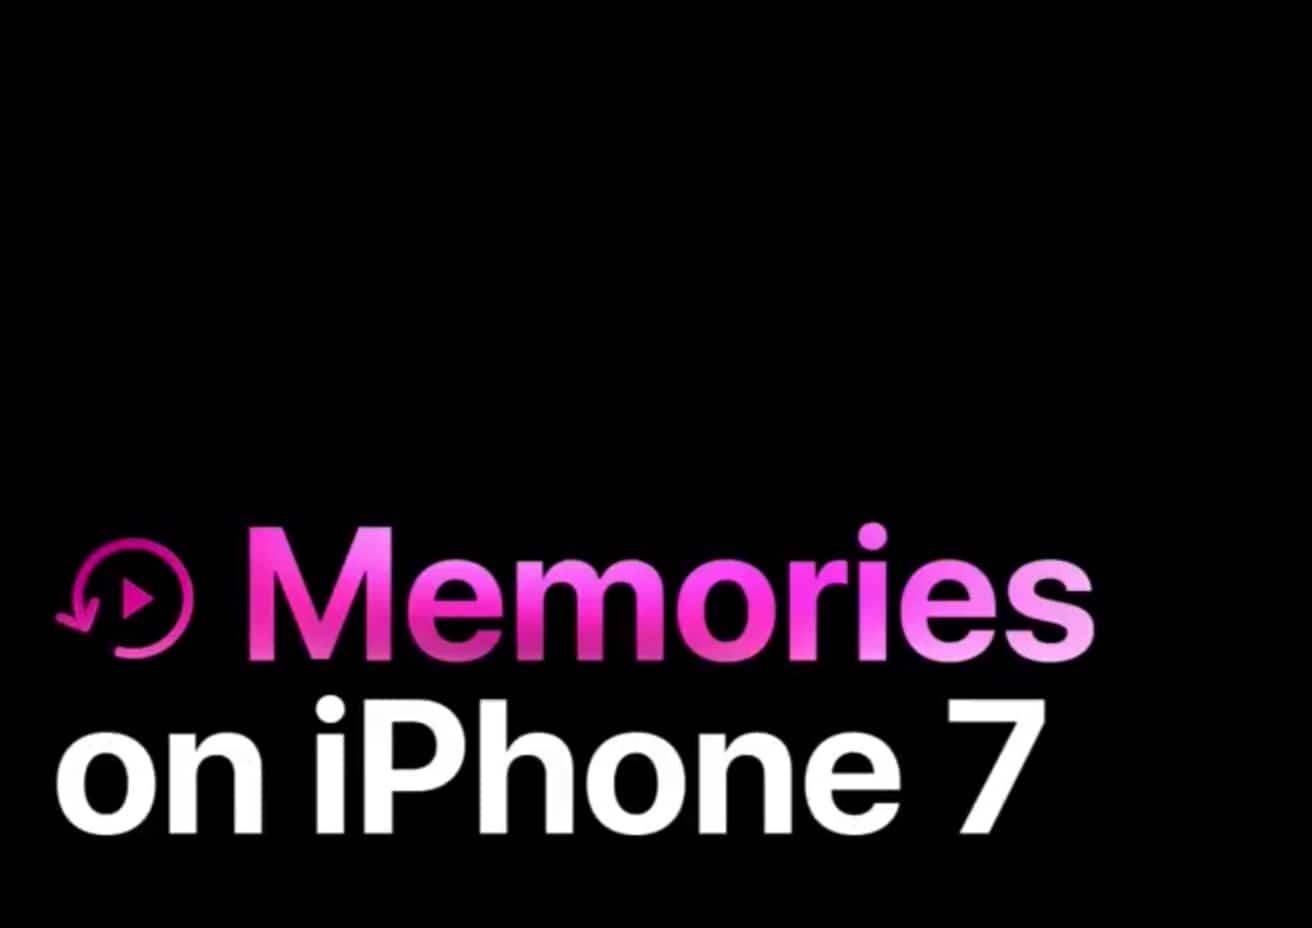 Memories on iPhone